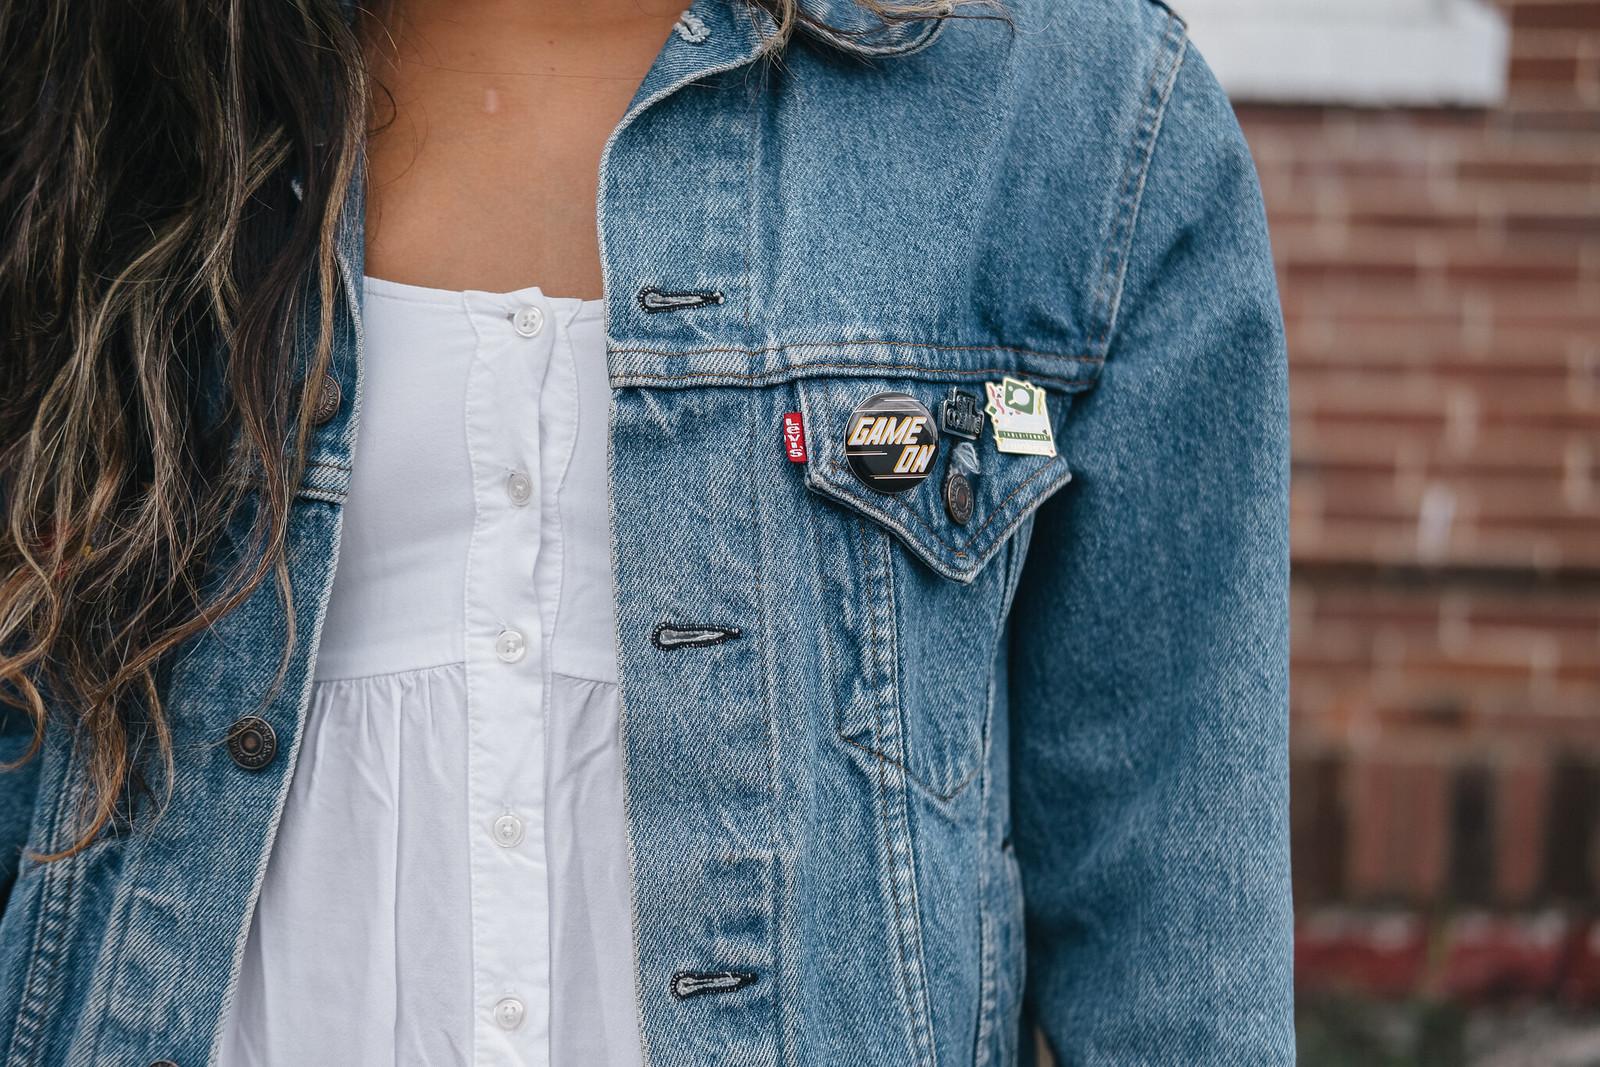 Priya the Blog, Nashville fashion blog, Nashville fashion blogger, Nashville style blog, Nashville style blogger, Summer outfit, white sundress for Summer, black booties for Summer, how to wear booties in the Summer, Girlactik lip paint, Rag & Bone Harrow booties, oversized denim jacket, vintage jean jacket